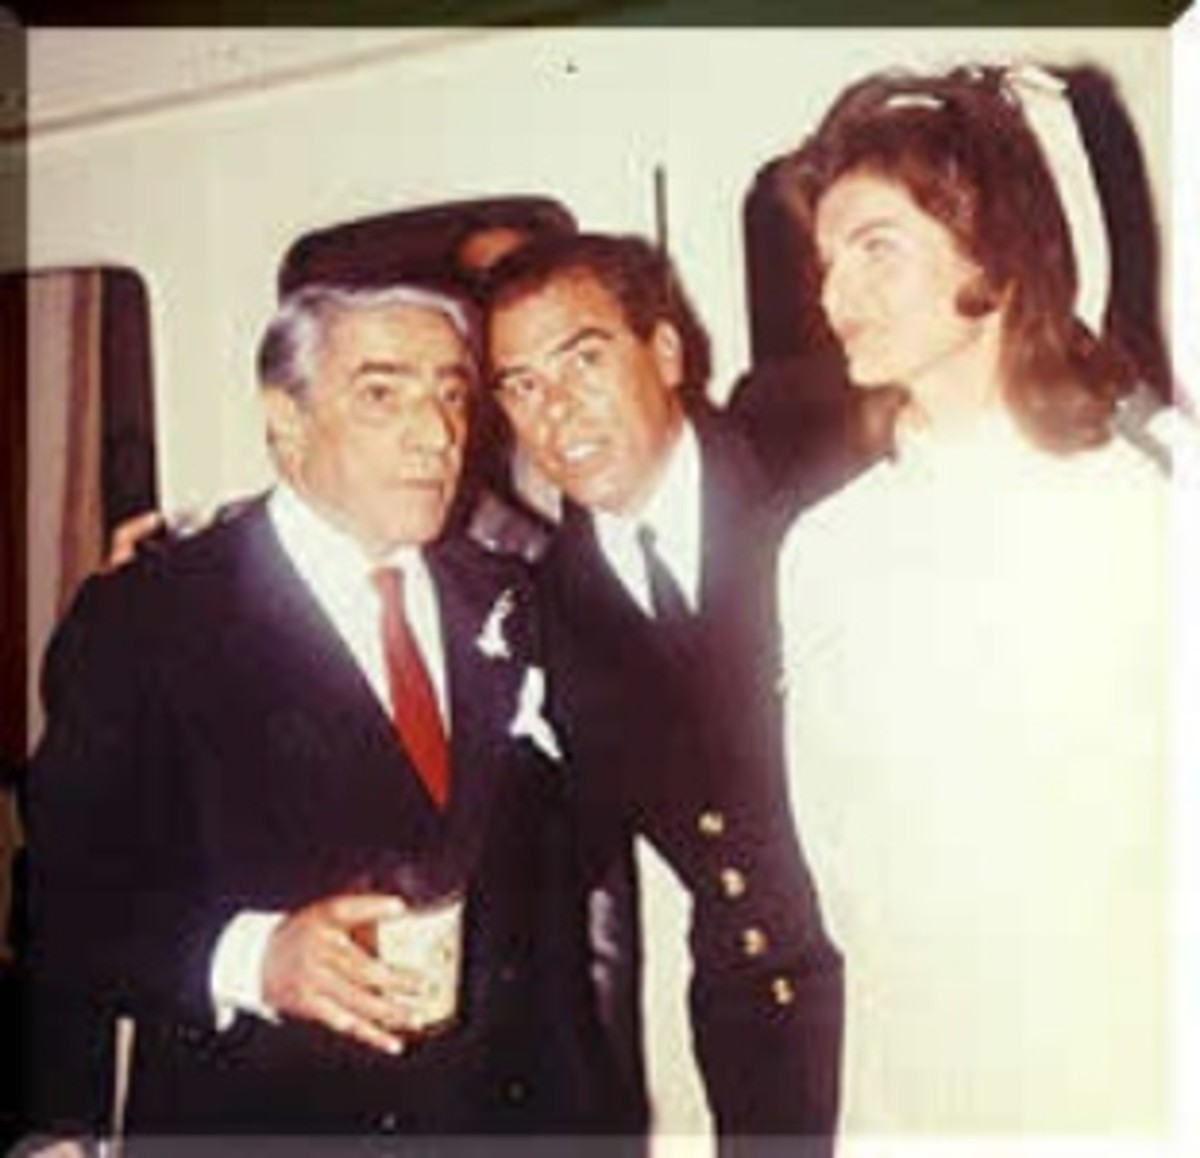 Aristotle Onasis and Jackie Kennedy on the Onasis Yacht